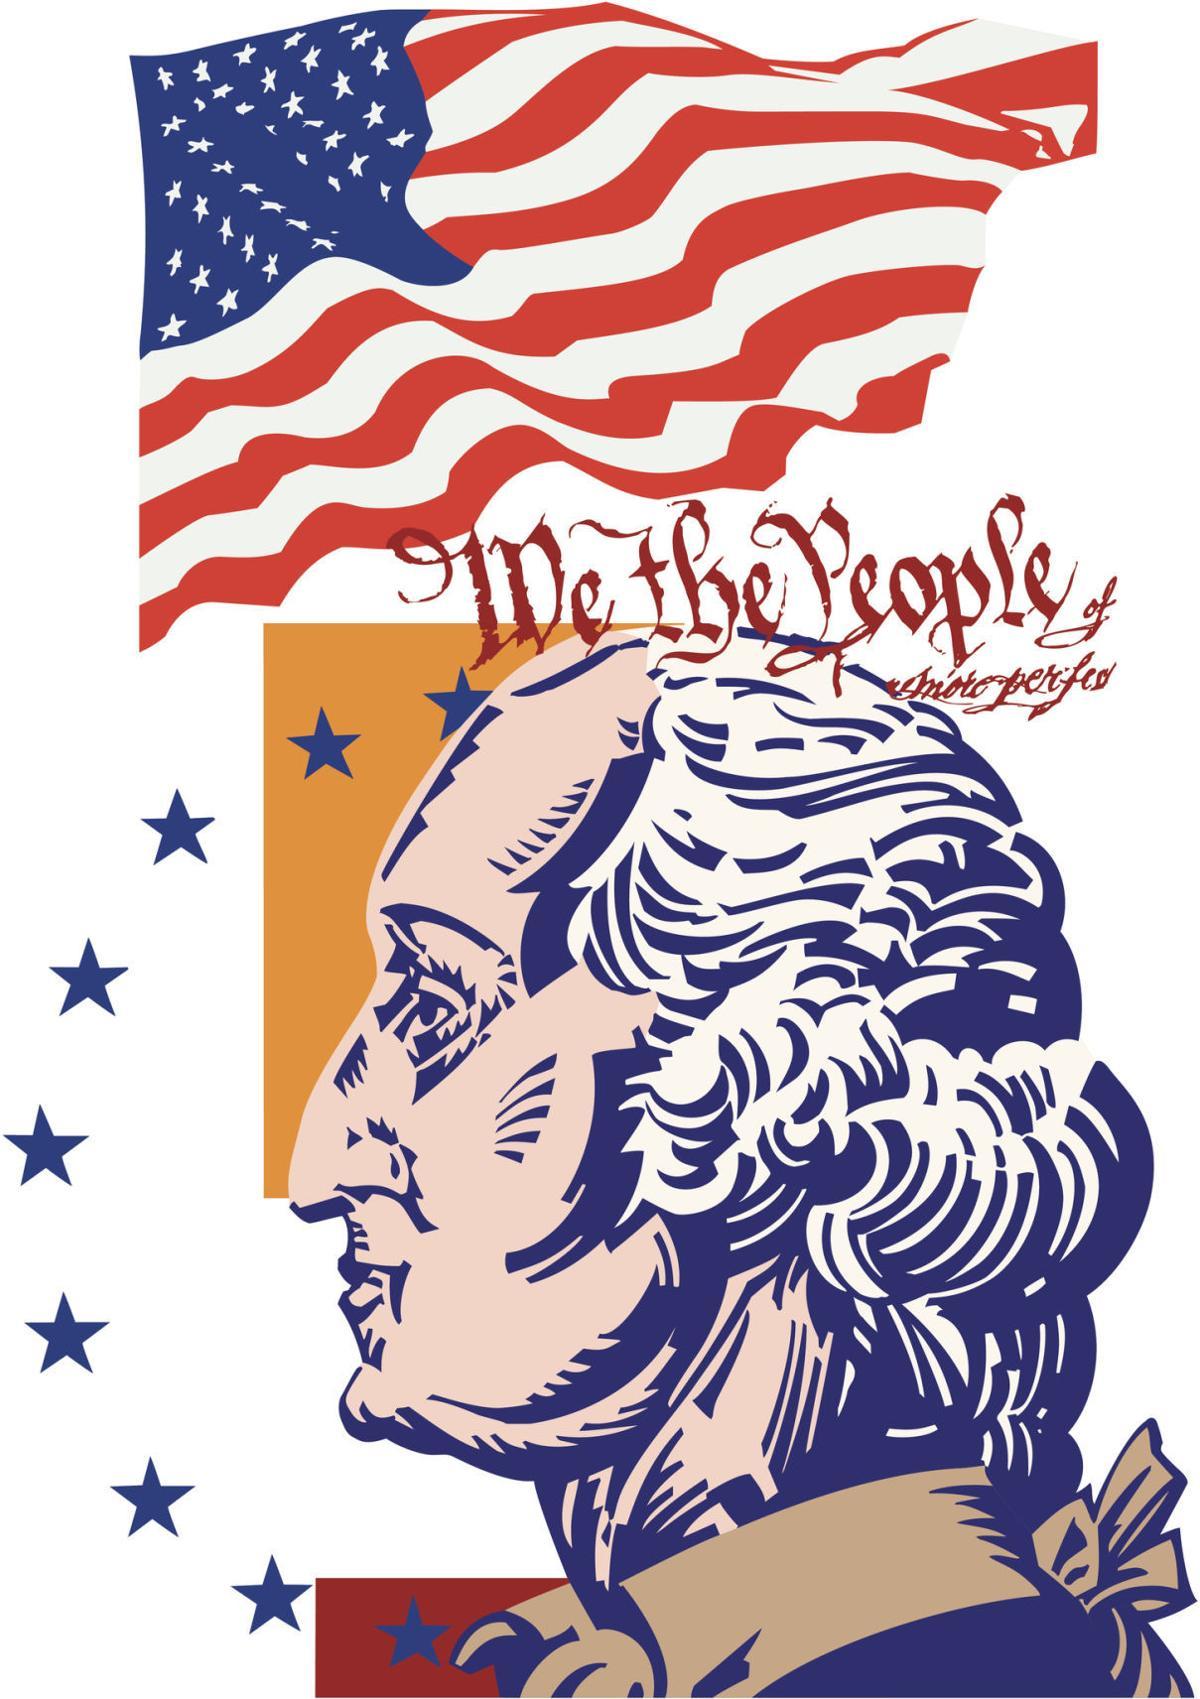 Washington s farewell address clipart clipart freeuse library Robert A. Strong column: The Founding Father and the ... clipart freeuse library